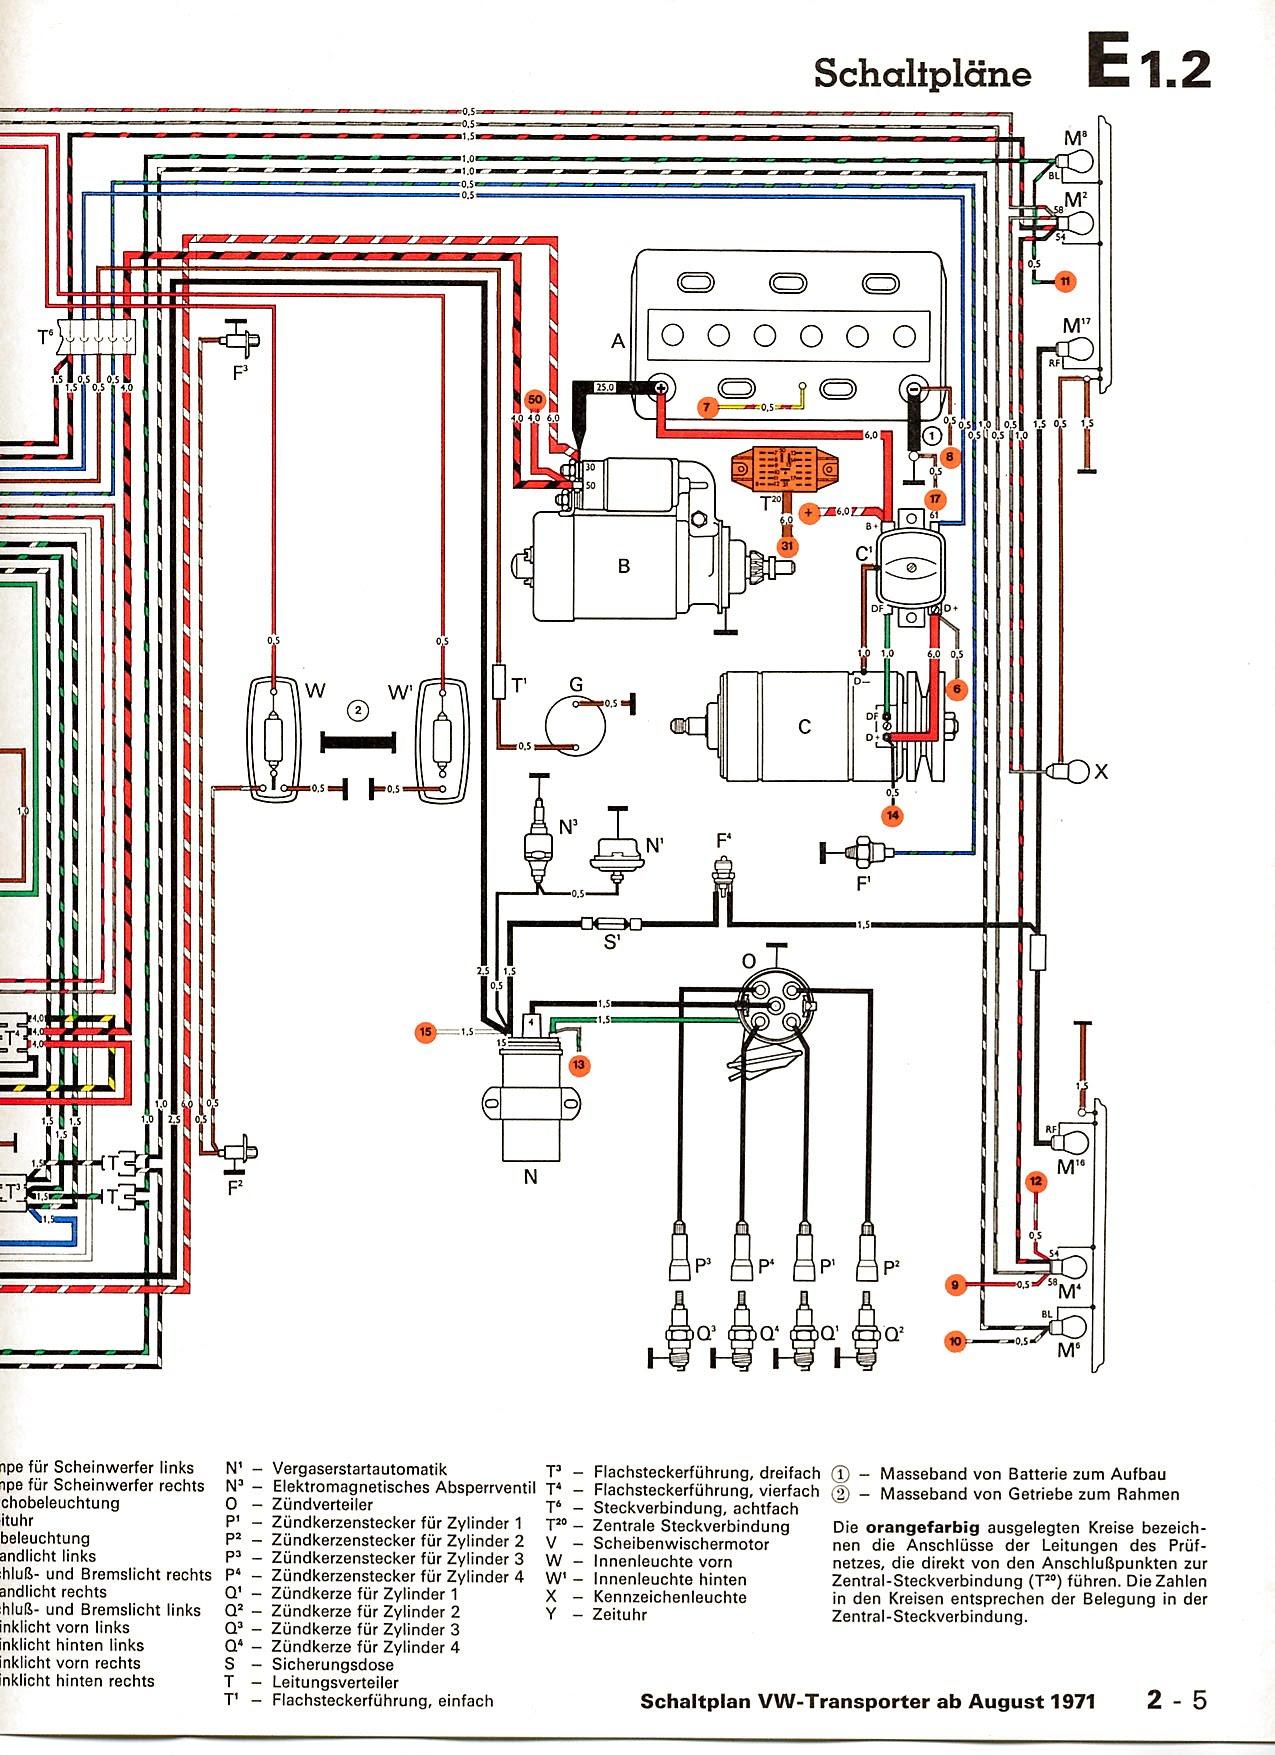 Diagram 1958 Vw Bus Wiring Diagram Full Version Hd Quality Wiring Diagram Dowiring18 Lasagradellacastagna It